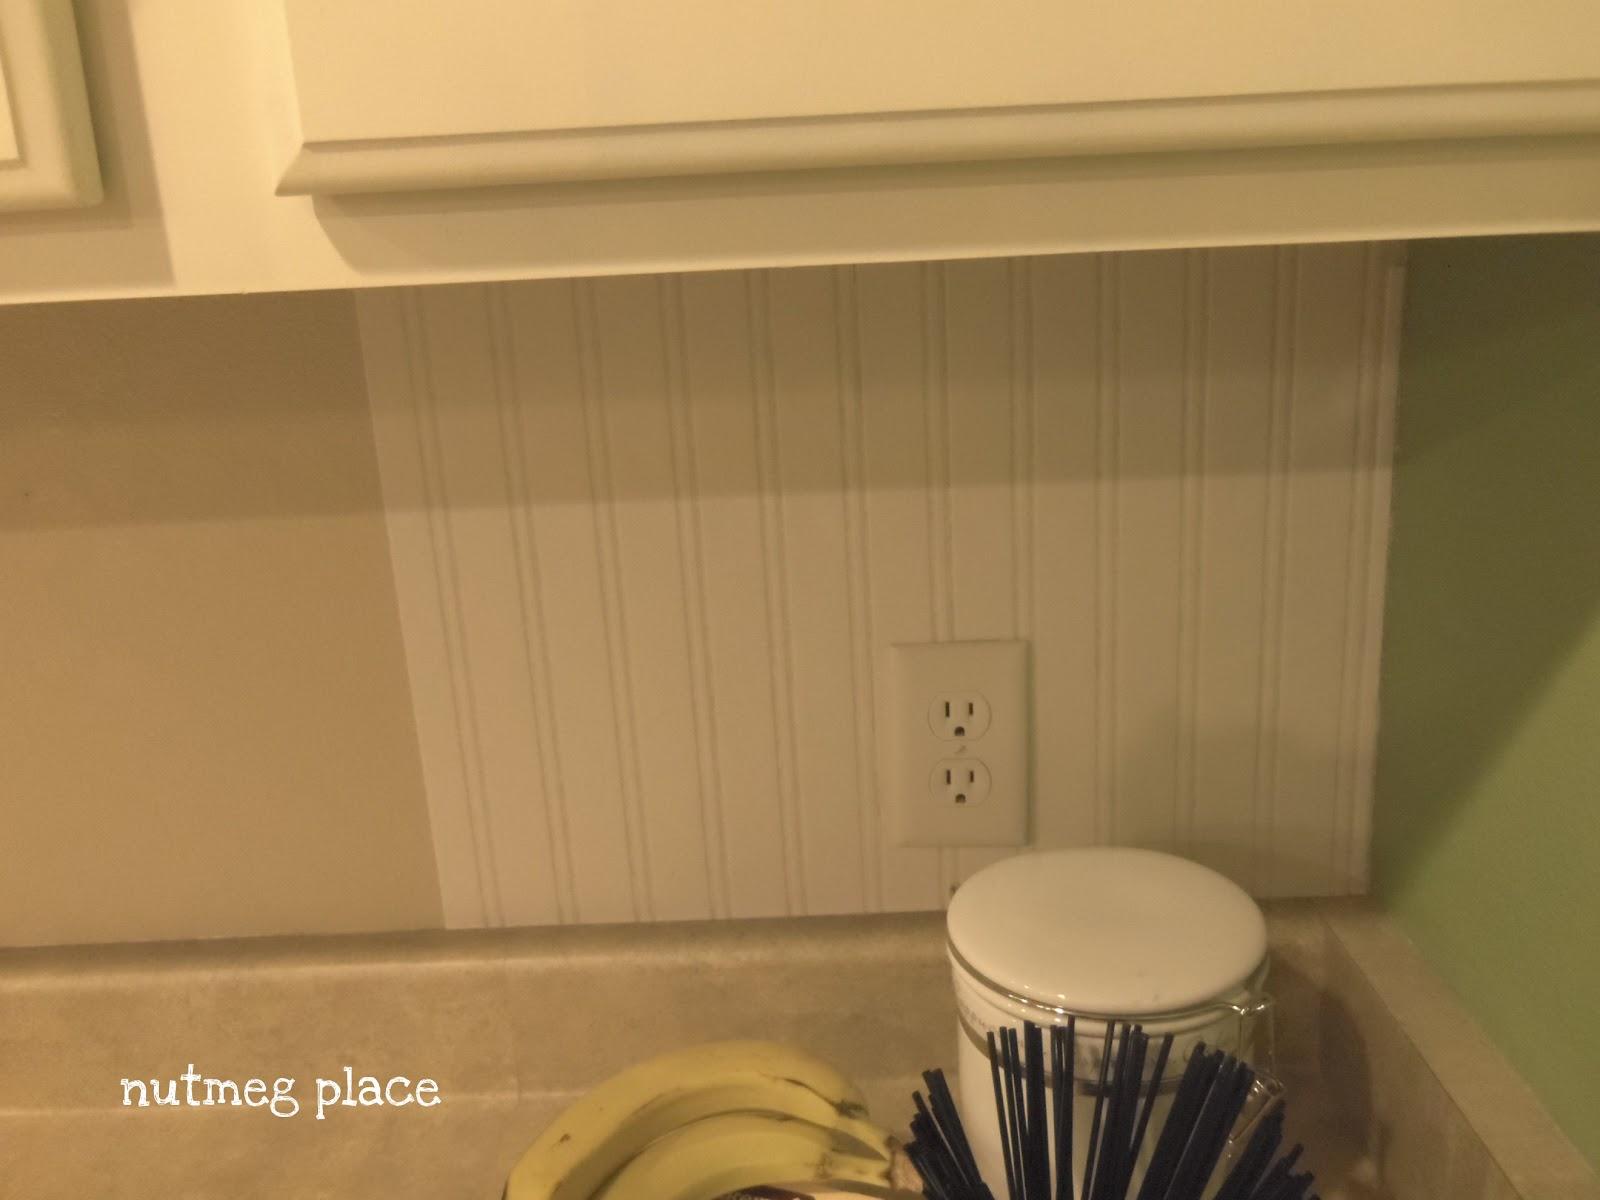 Beadboard Backsplash Using Wallpaper   Mom 4 Real 1600x1200